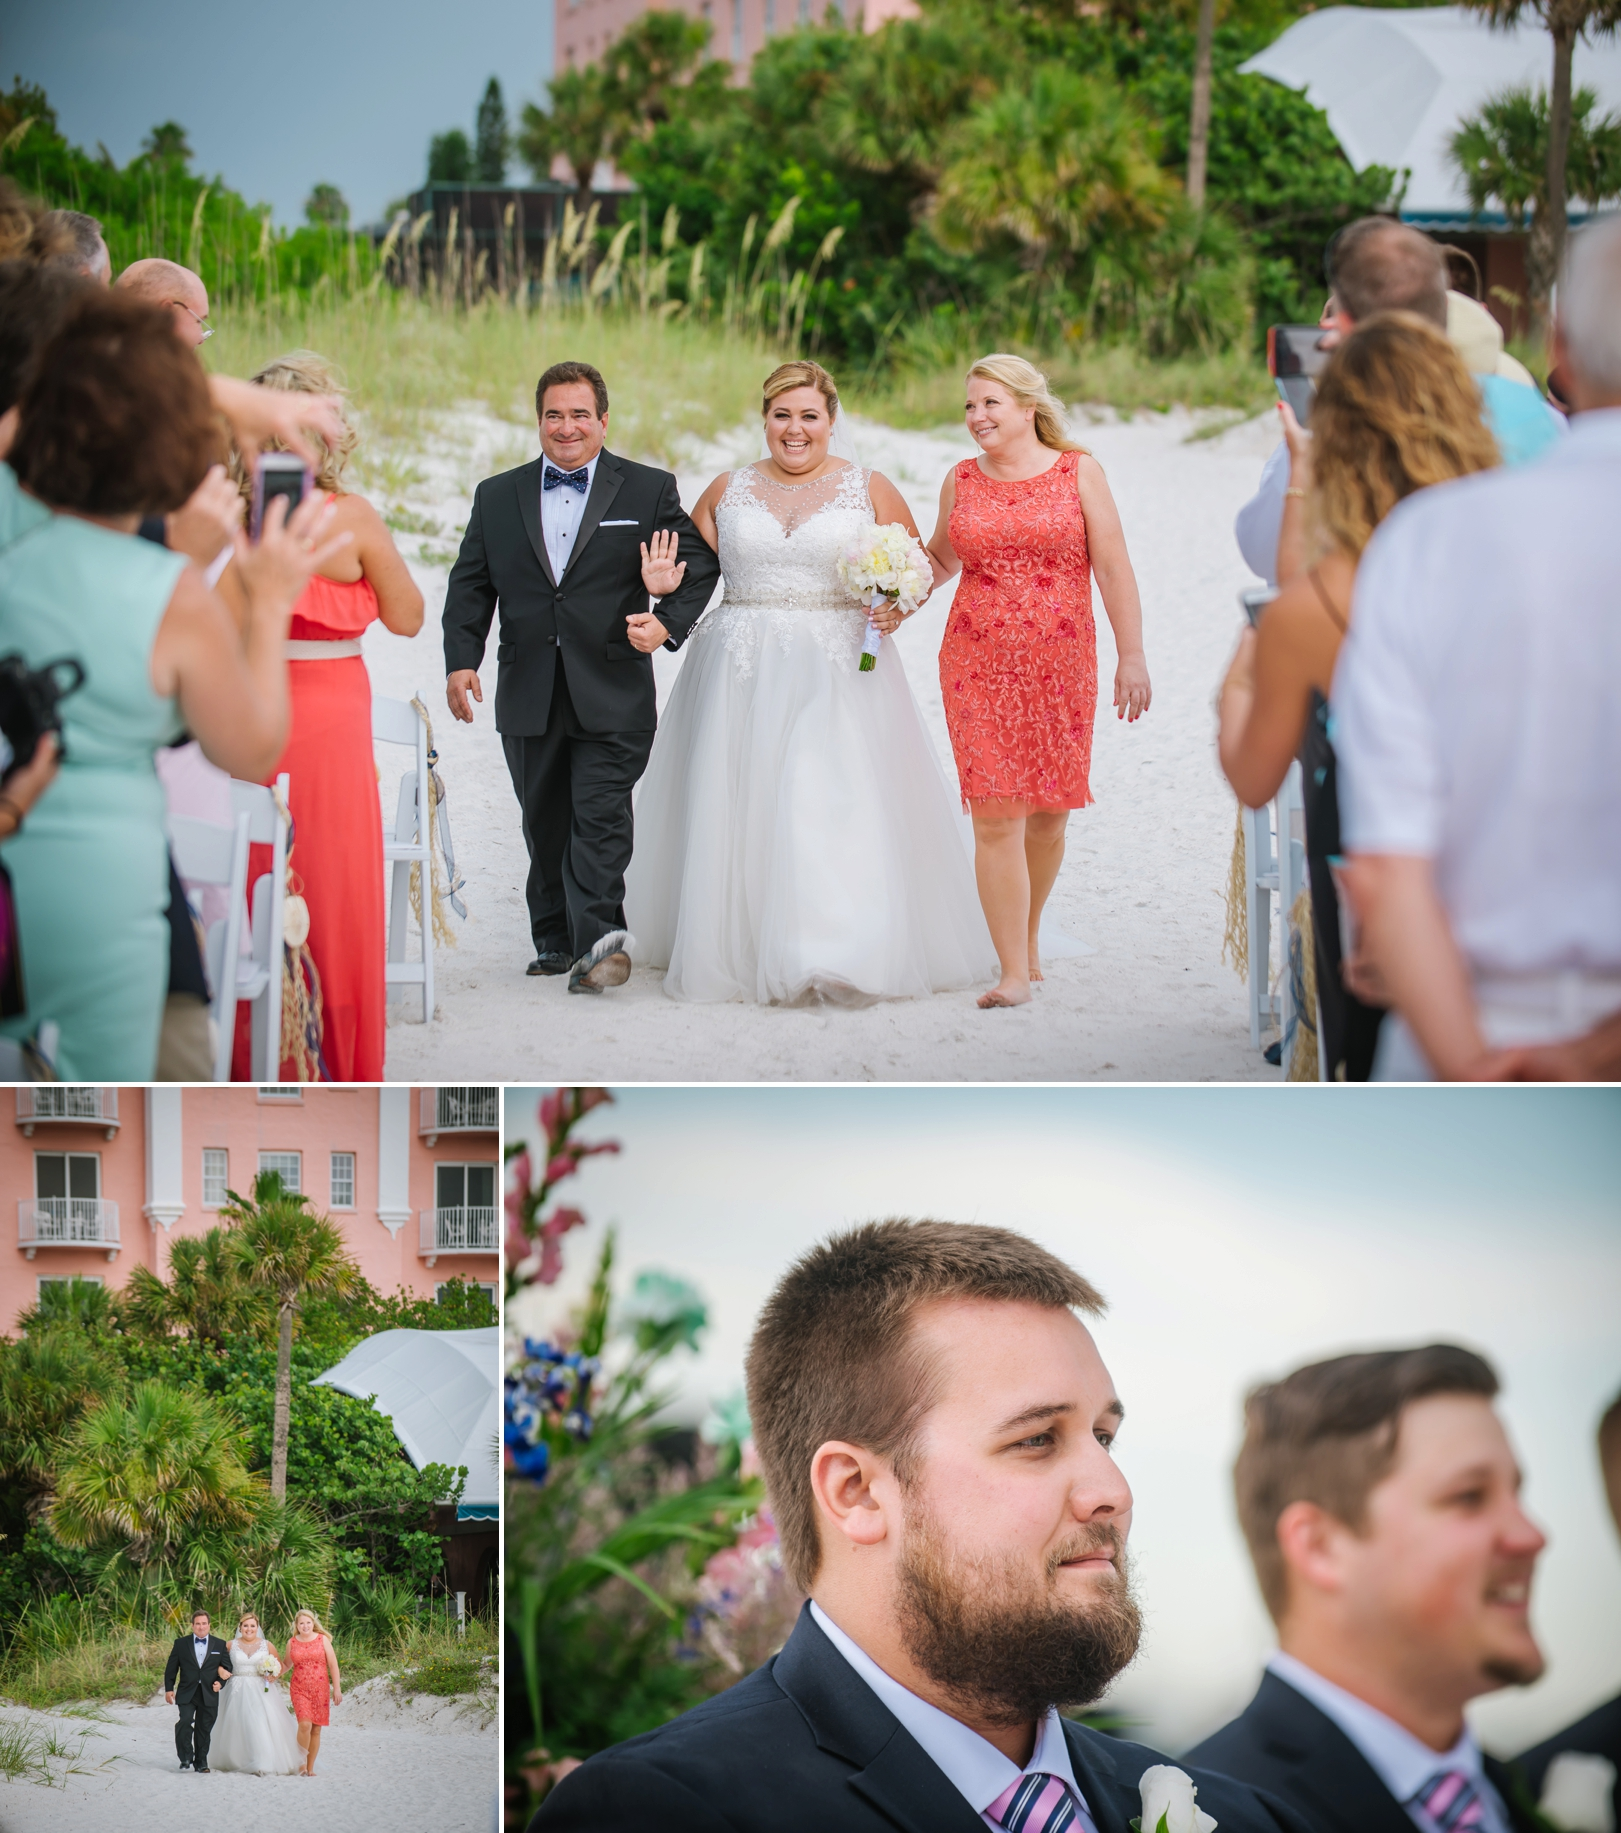 St-pete-wedding-photographer-don-caesar-ashlee-hamon_0015.jpg